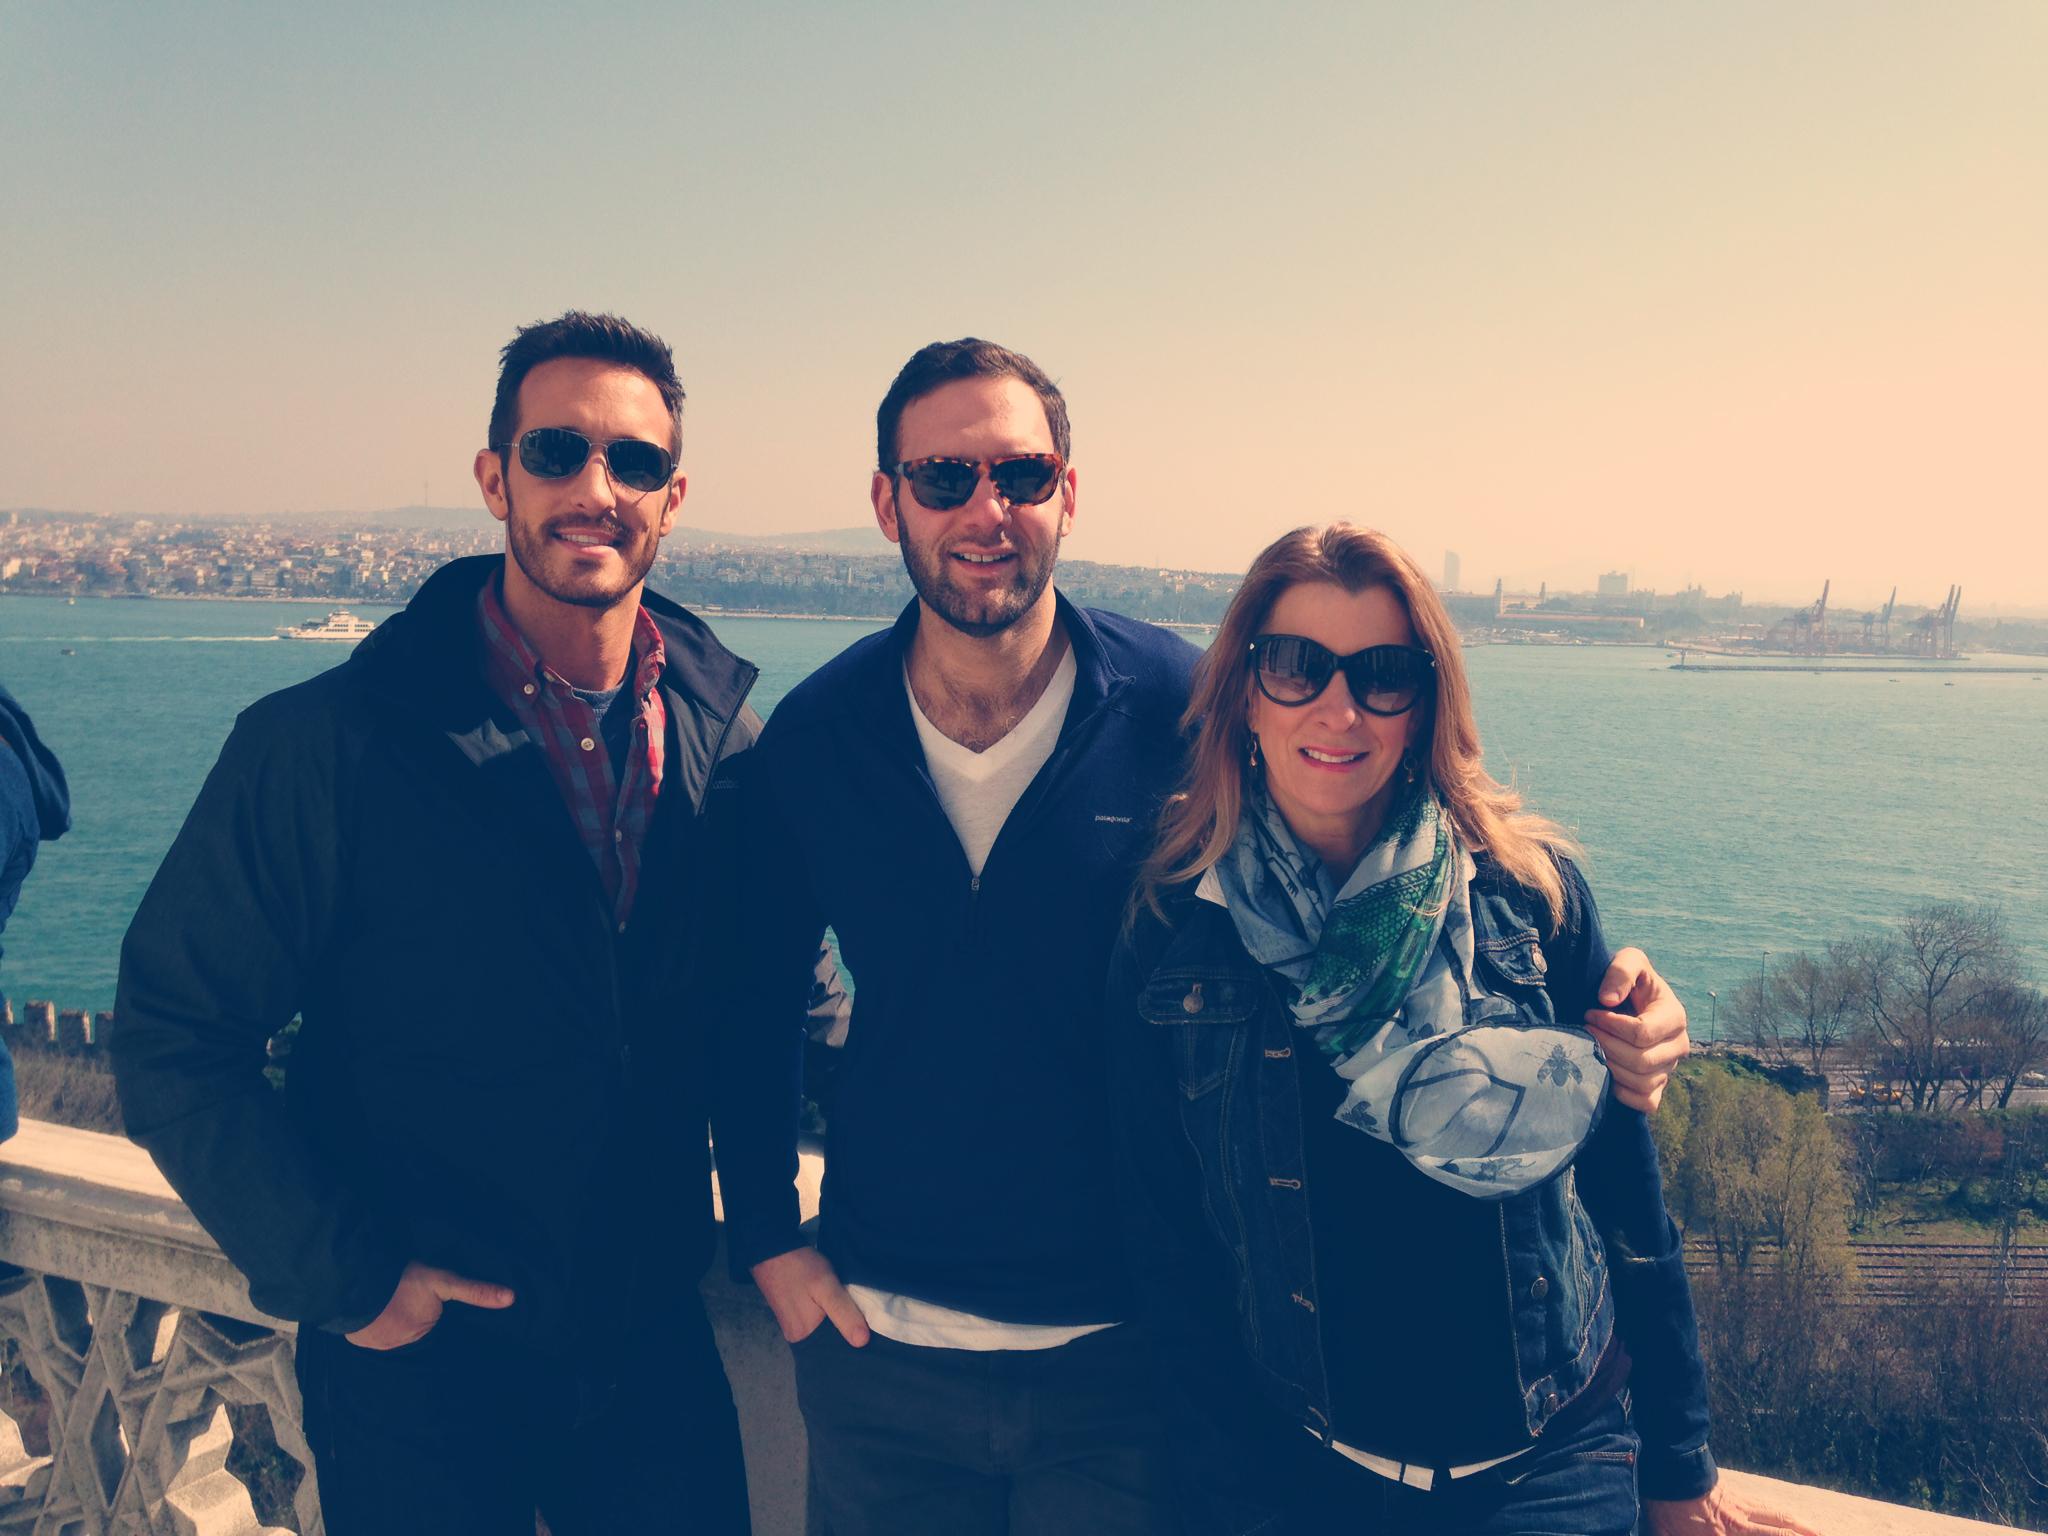 Rick, Linda, and Me at Topkapi Palace